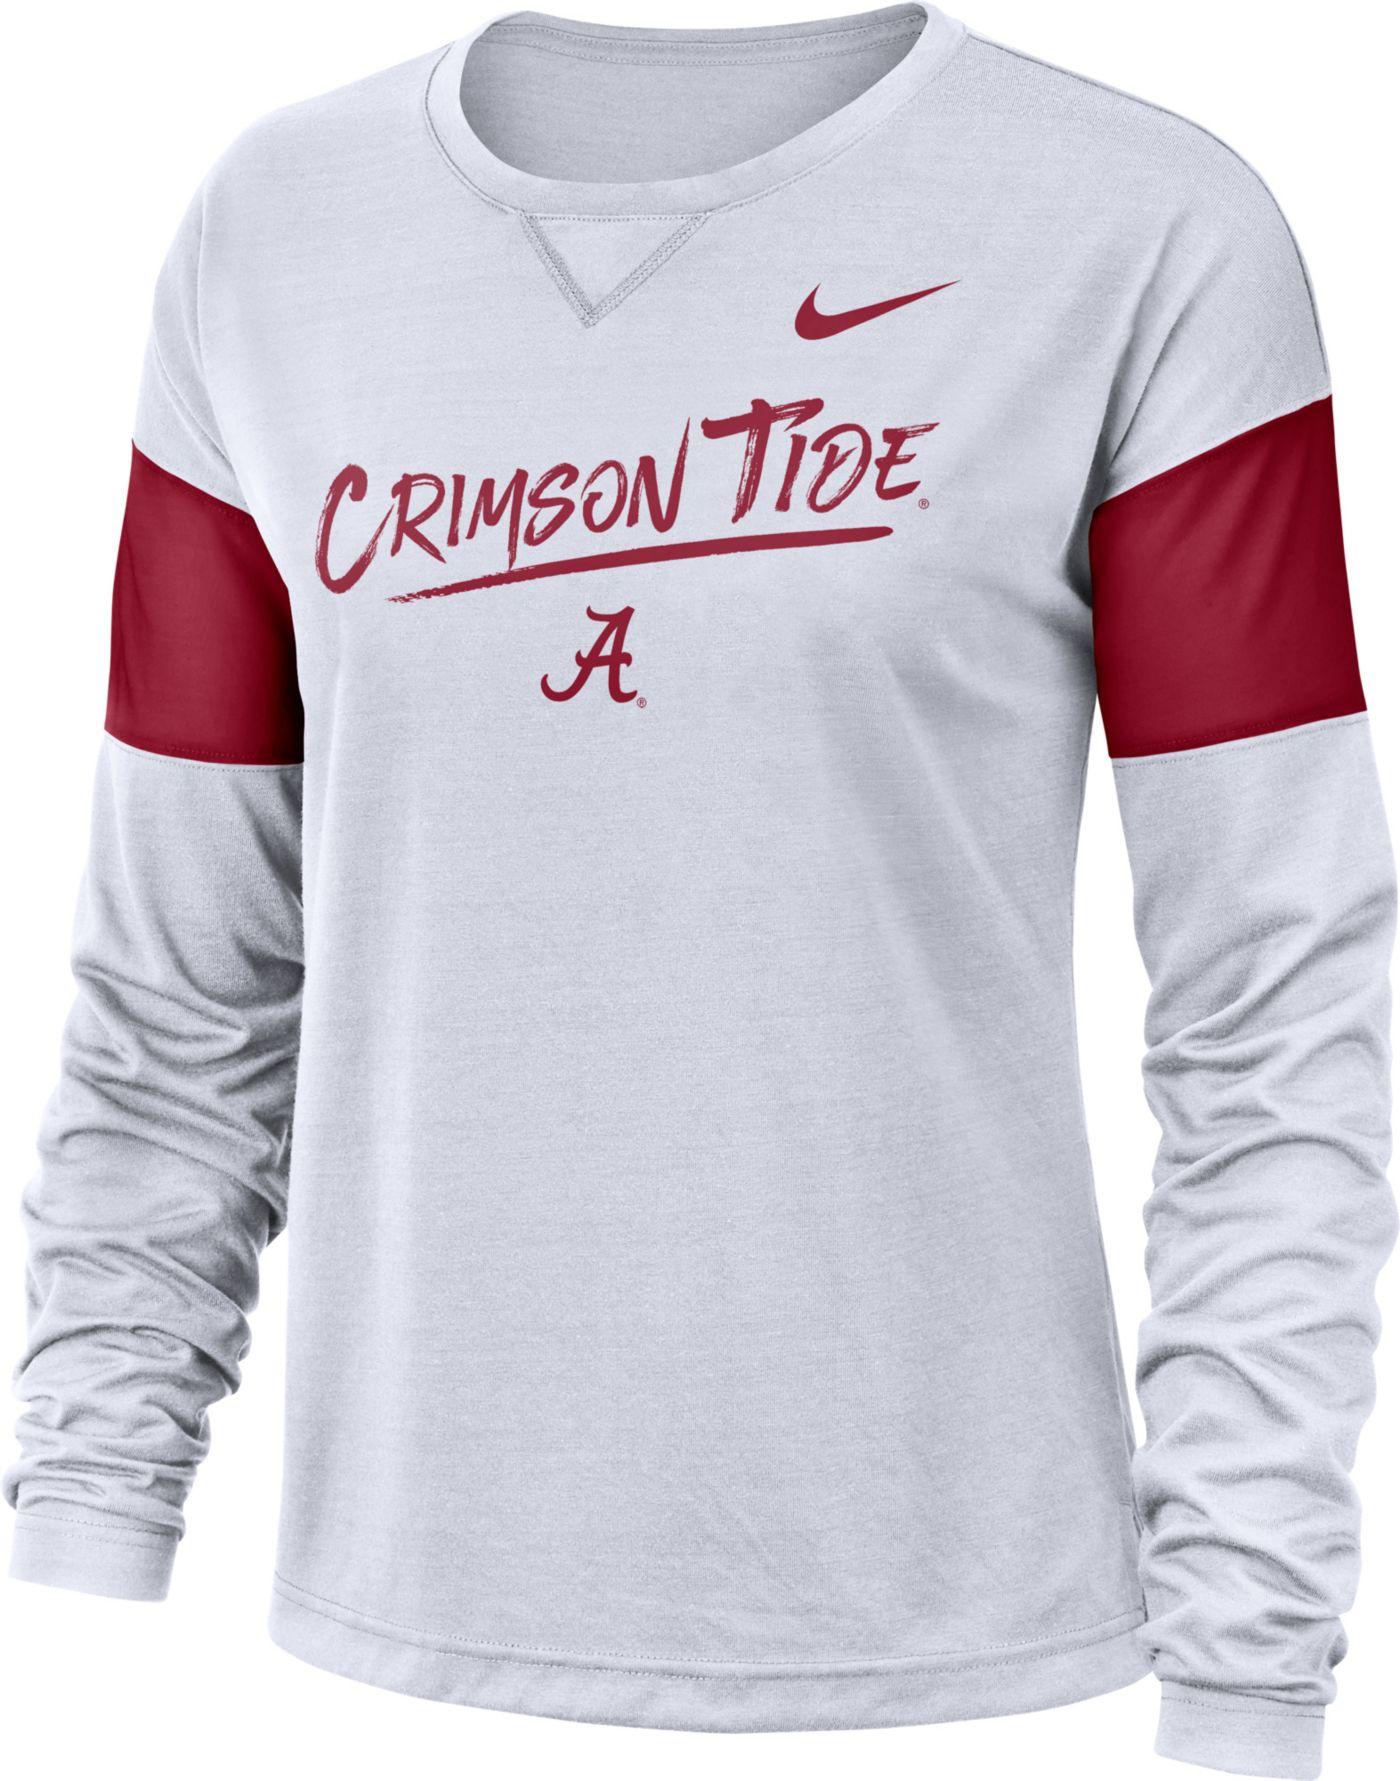 Nike Women's Alabama Crimson Tide Dri-FIT Breathe Long Sleeve White T-Shirt